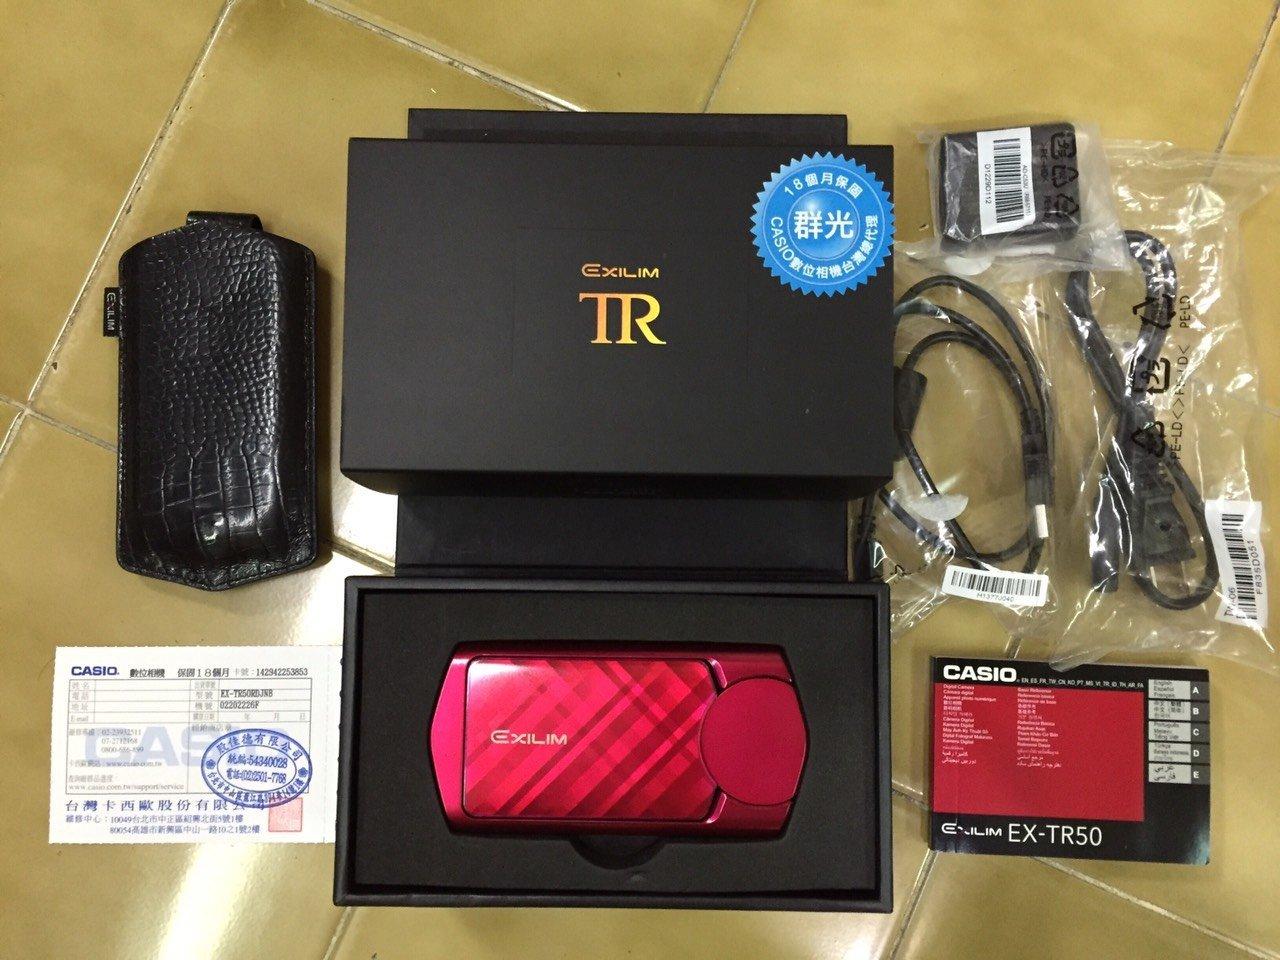 二手 CASIO TR50 EX-TR50 自拍神器 公司貨 紅色